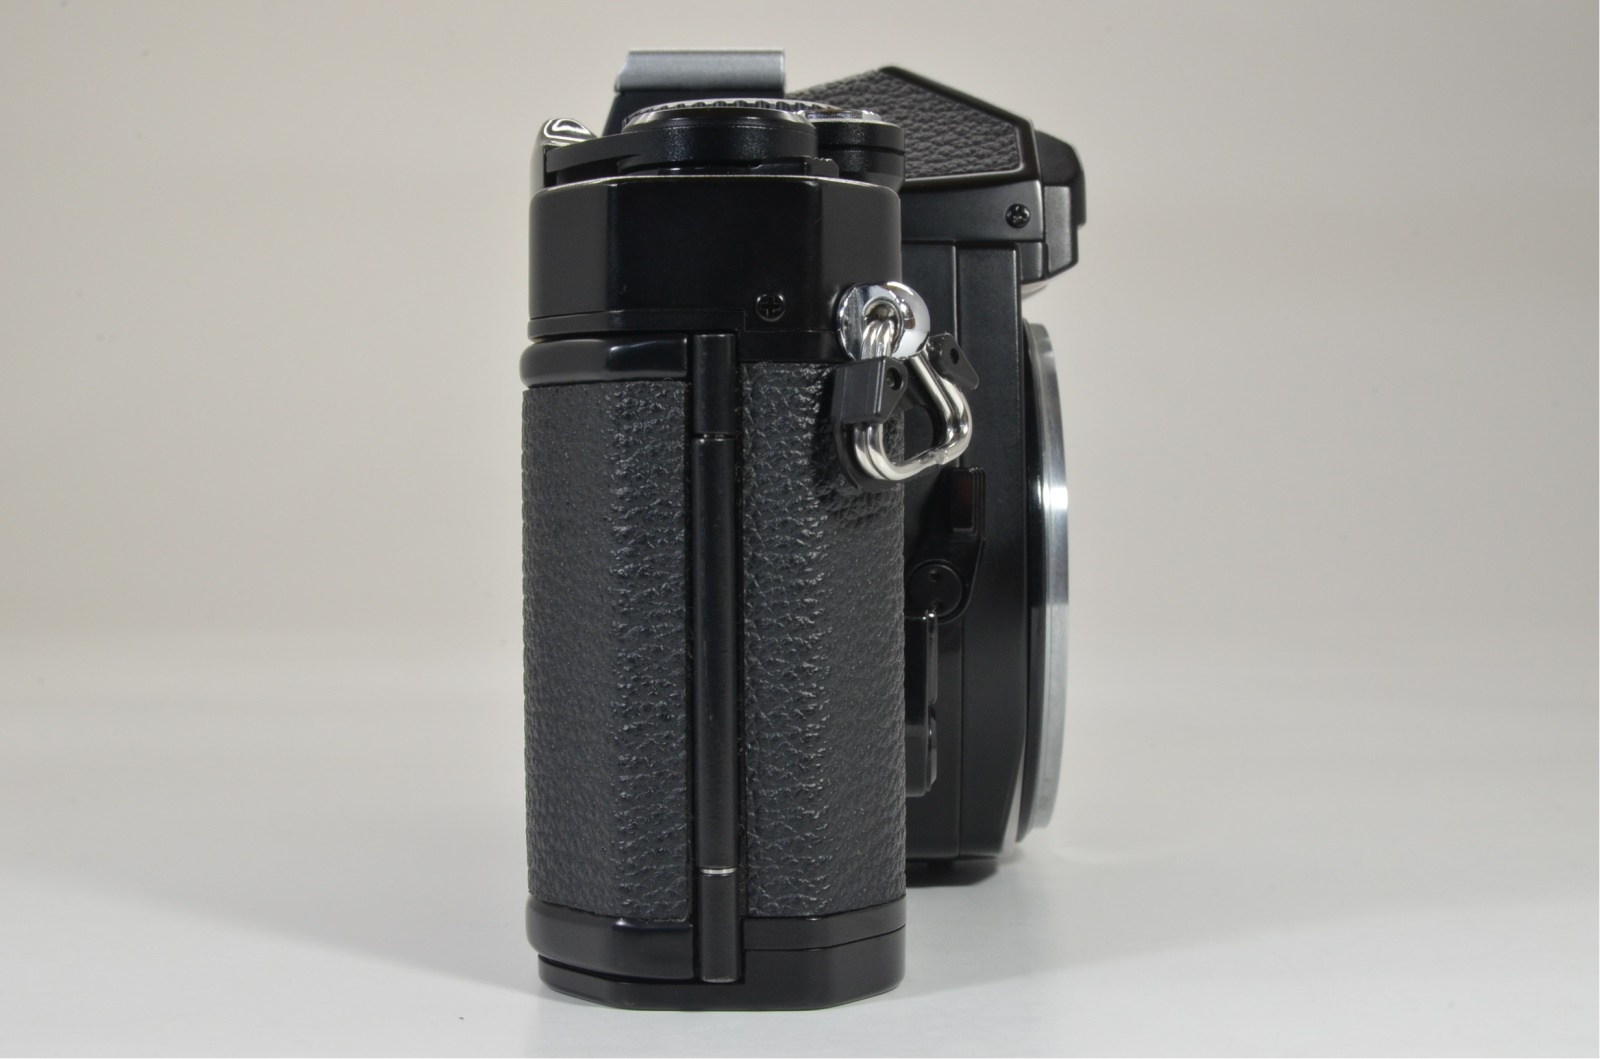 nikon fm3a 35mm film camera black with b3 focusing screen shooting tested